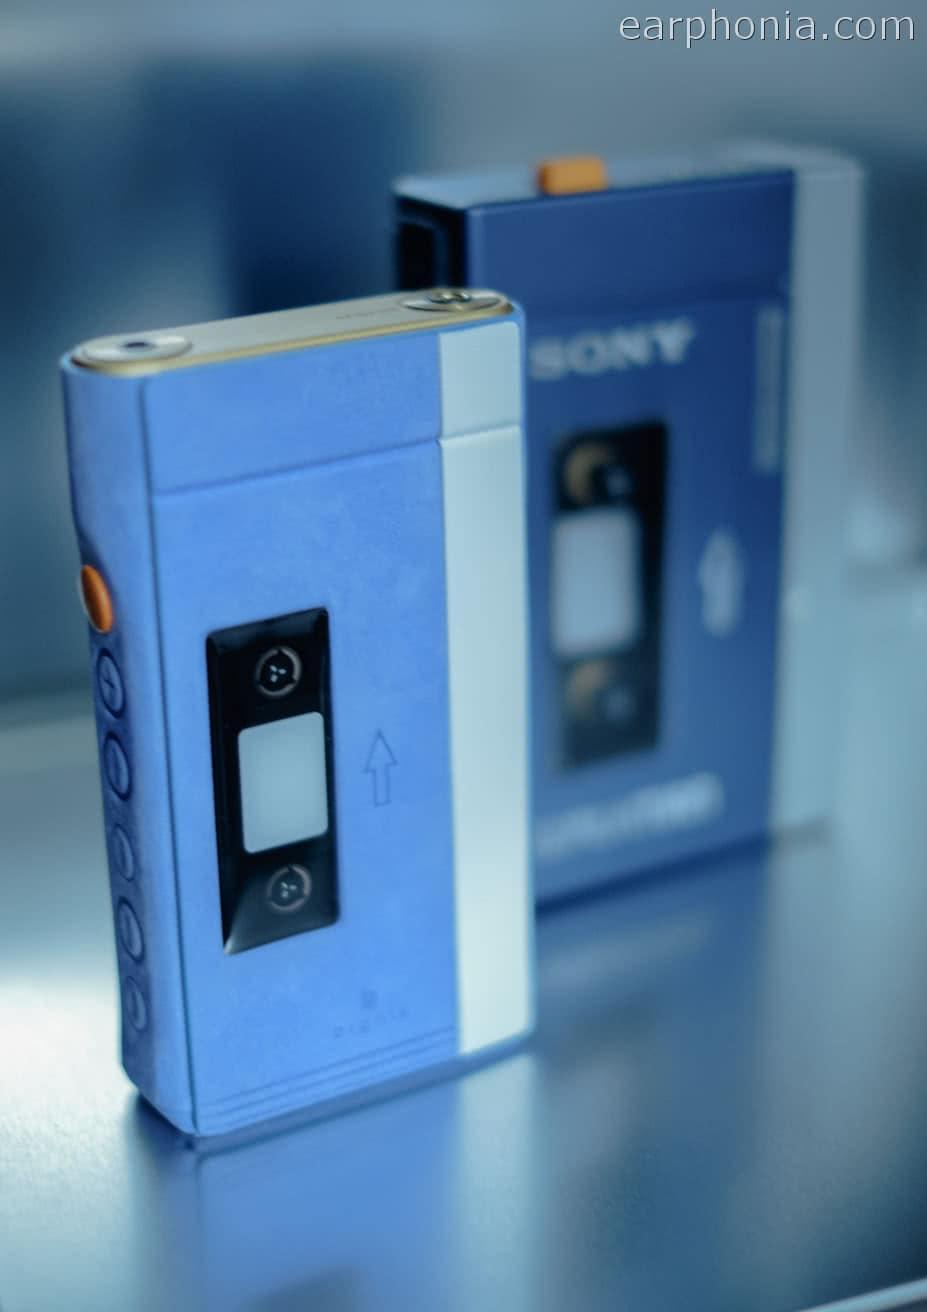 earphonia.com-Sony-Walkman-TPSL2-Rare-Dignis-Case